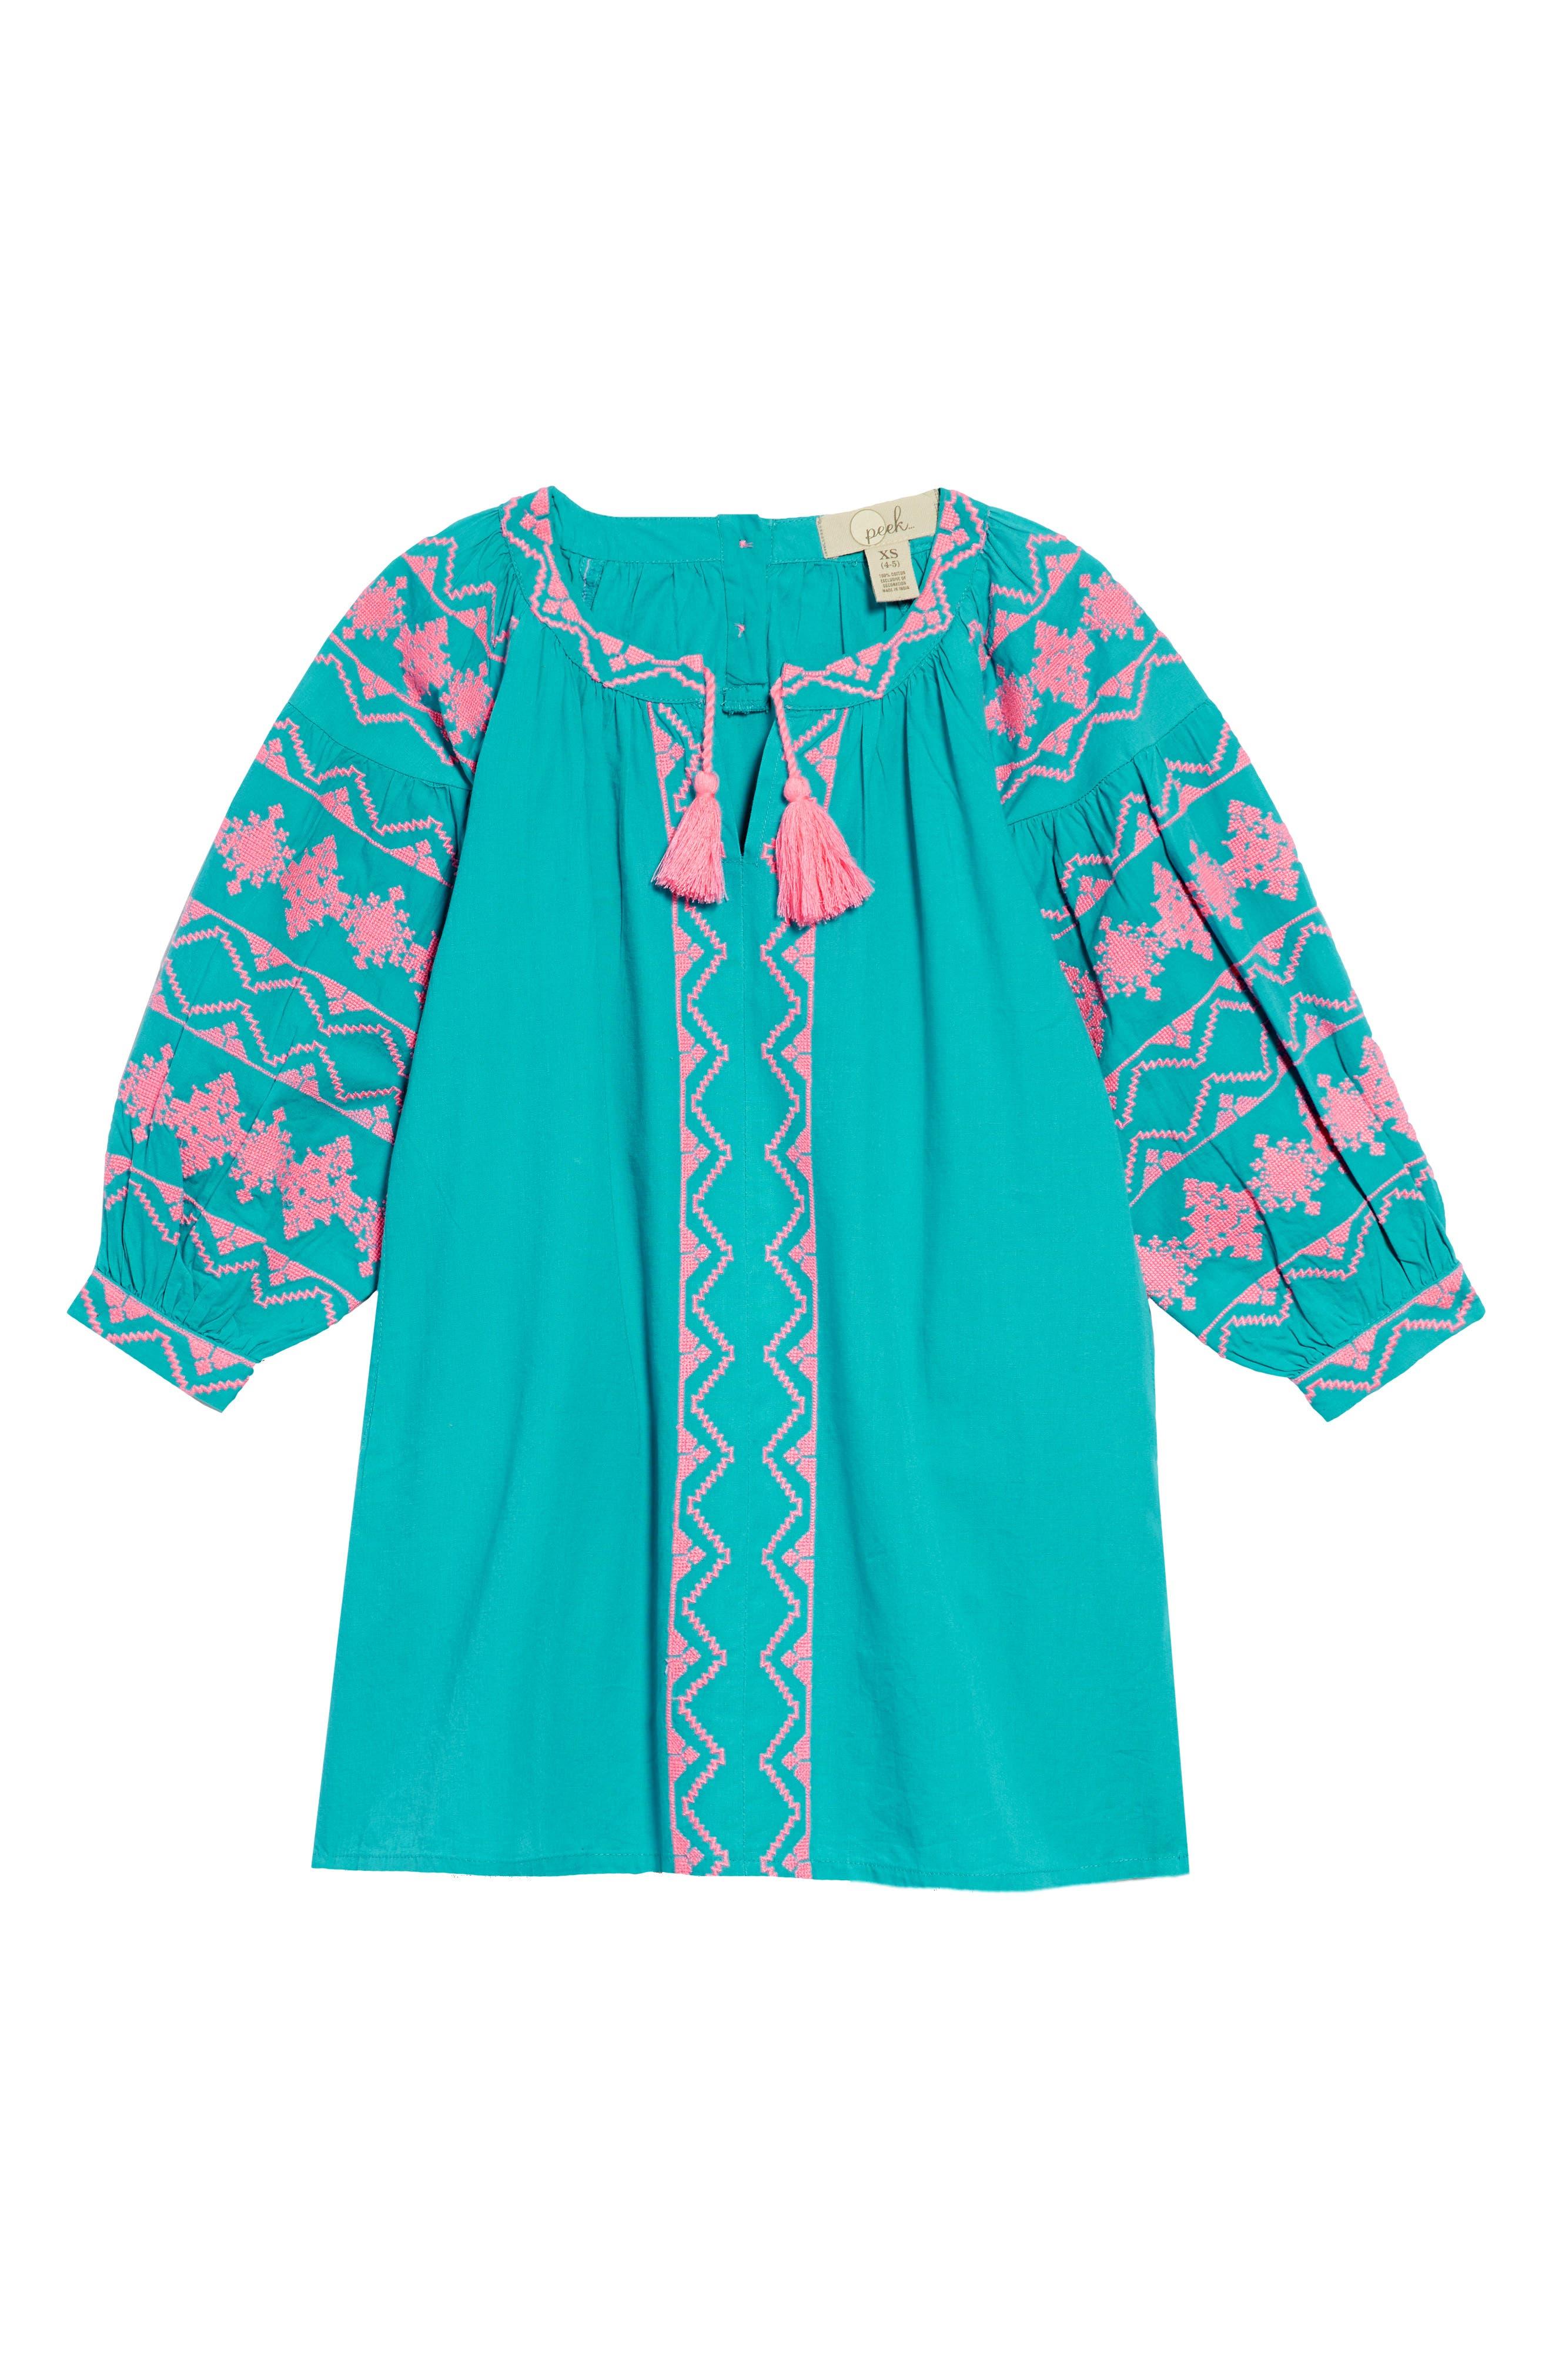 Peek Kellie Embroidered Dress,                             Main thumbnail 1, color,                             440